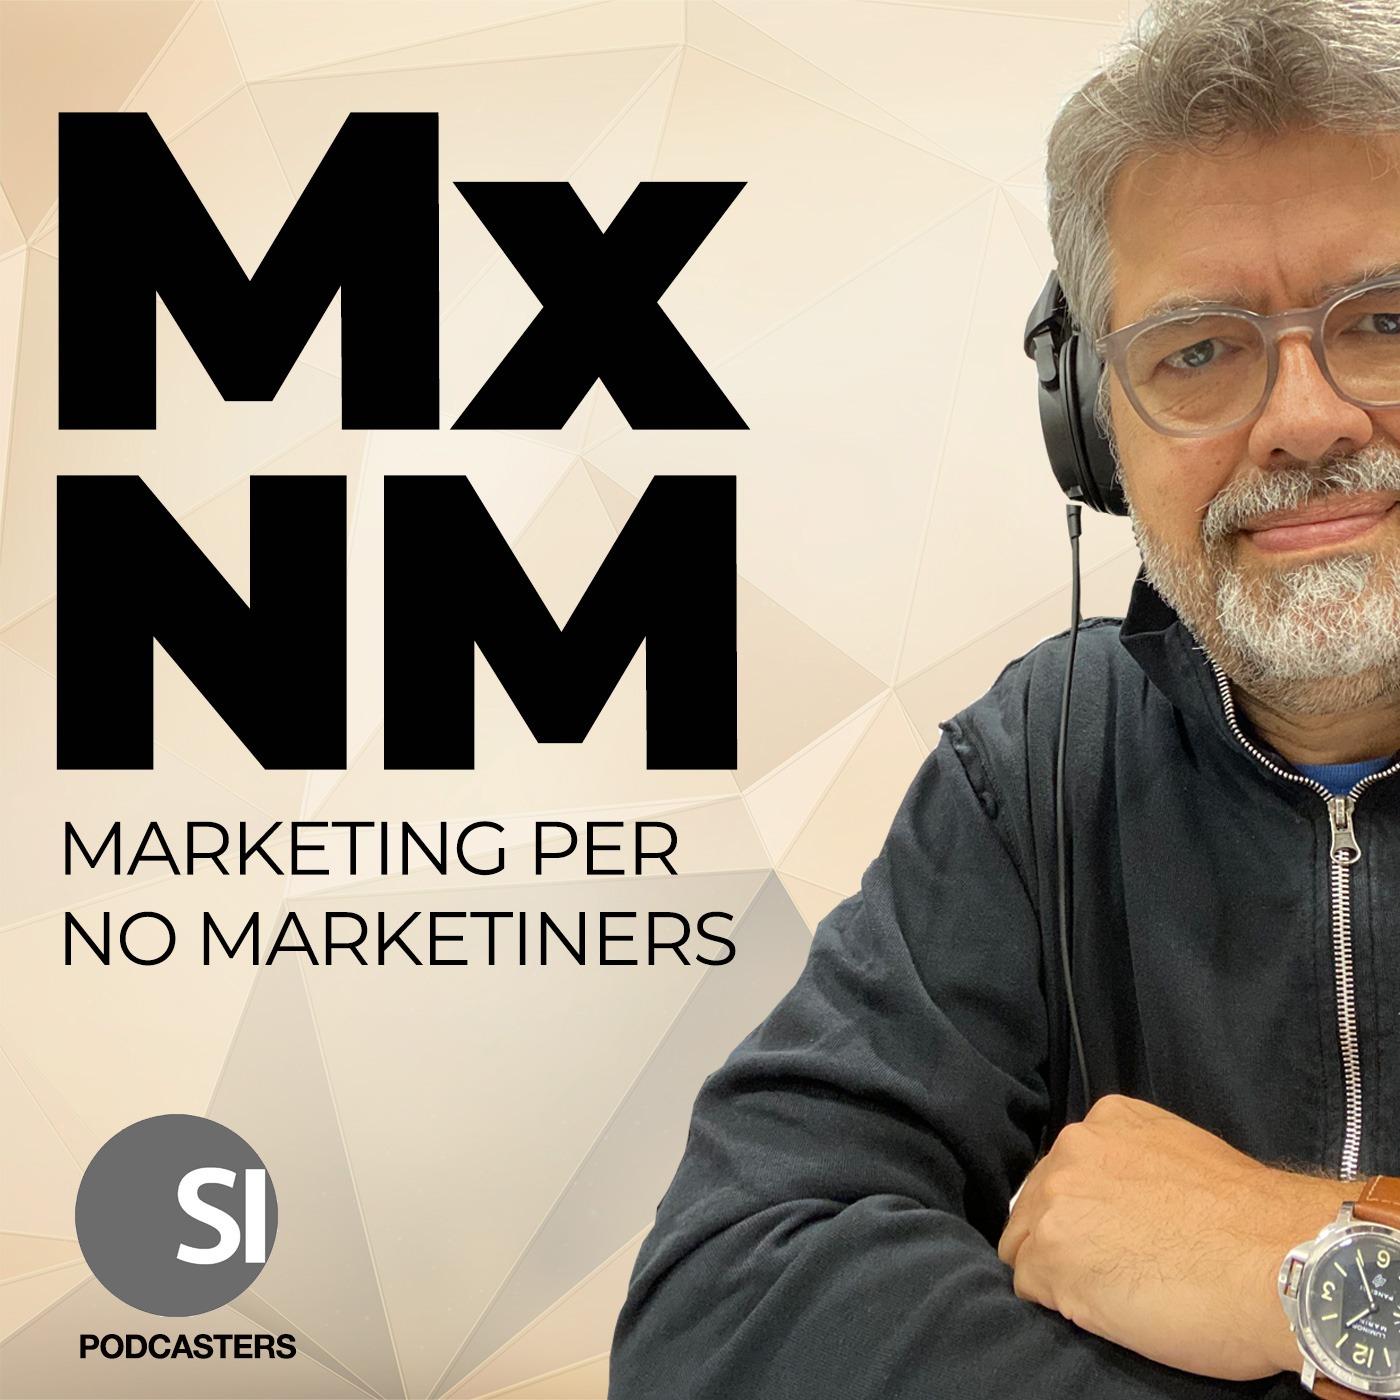 Podcast Marketing per No Marketiners